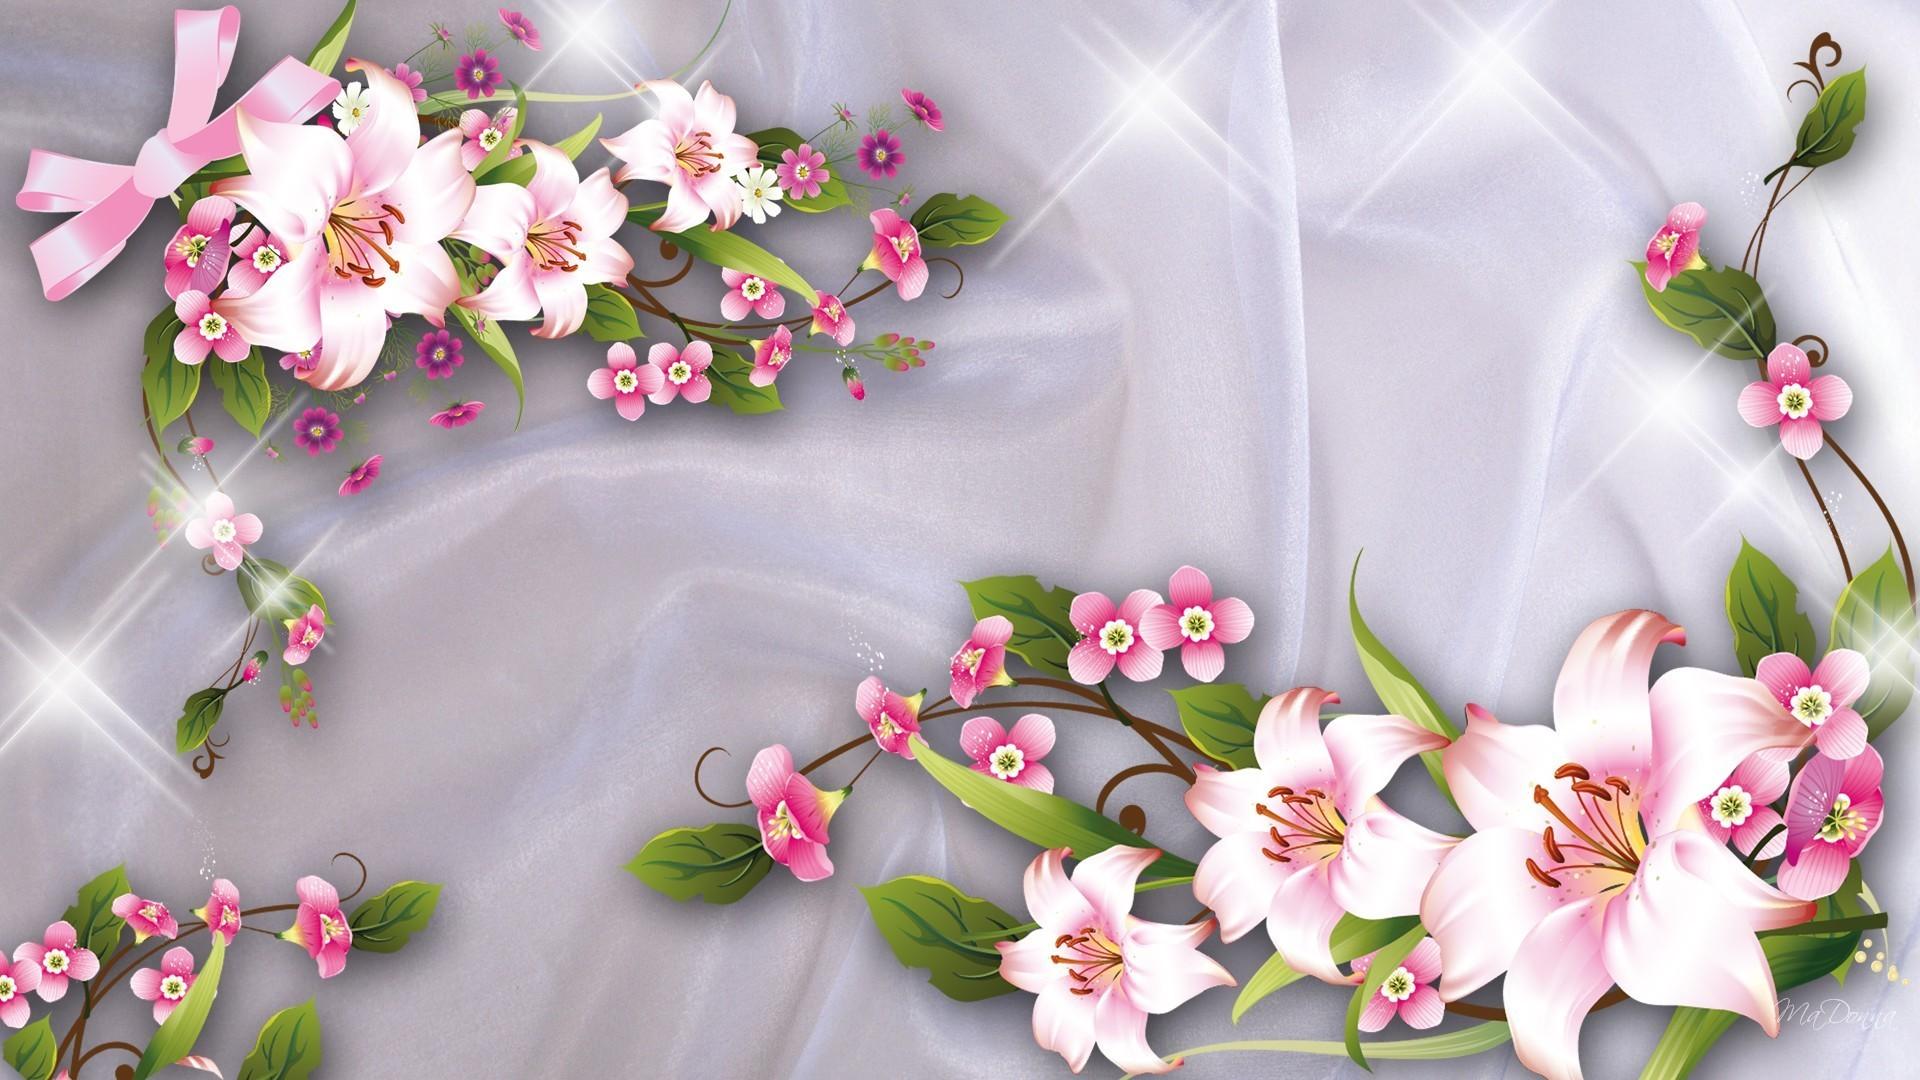 Bows Satin Shiny Flowers Lilies Sparkles Ribbons Stars Pink Flower Desktop  Wallpaper Hd